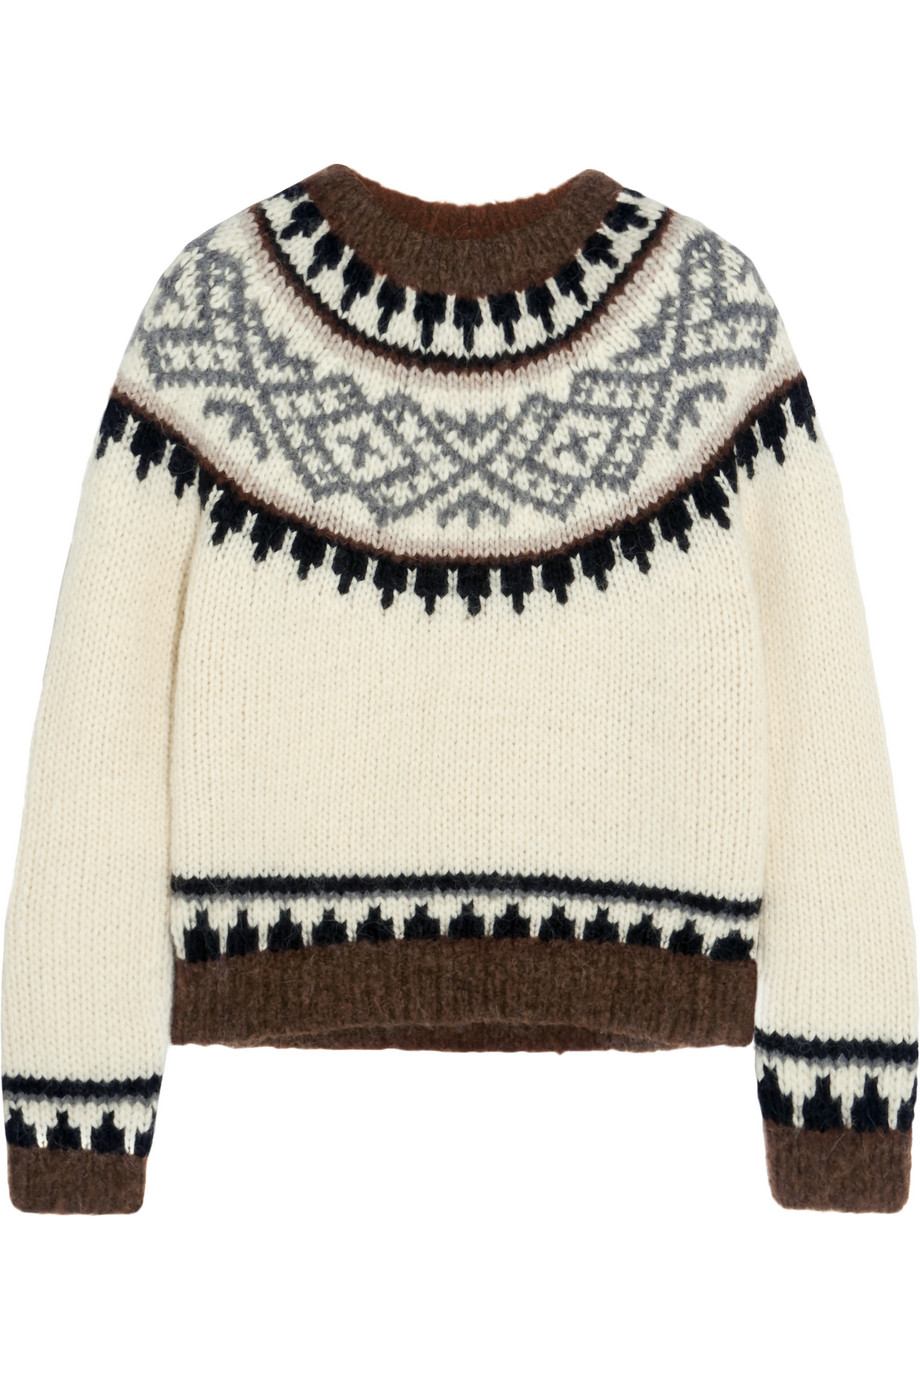 J.Crew Hudson Intarsia Knitted Sweater, Cream, Women's, Size: L